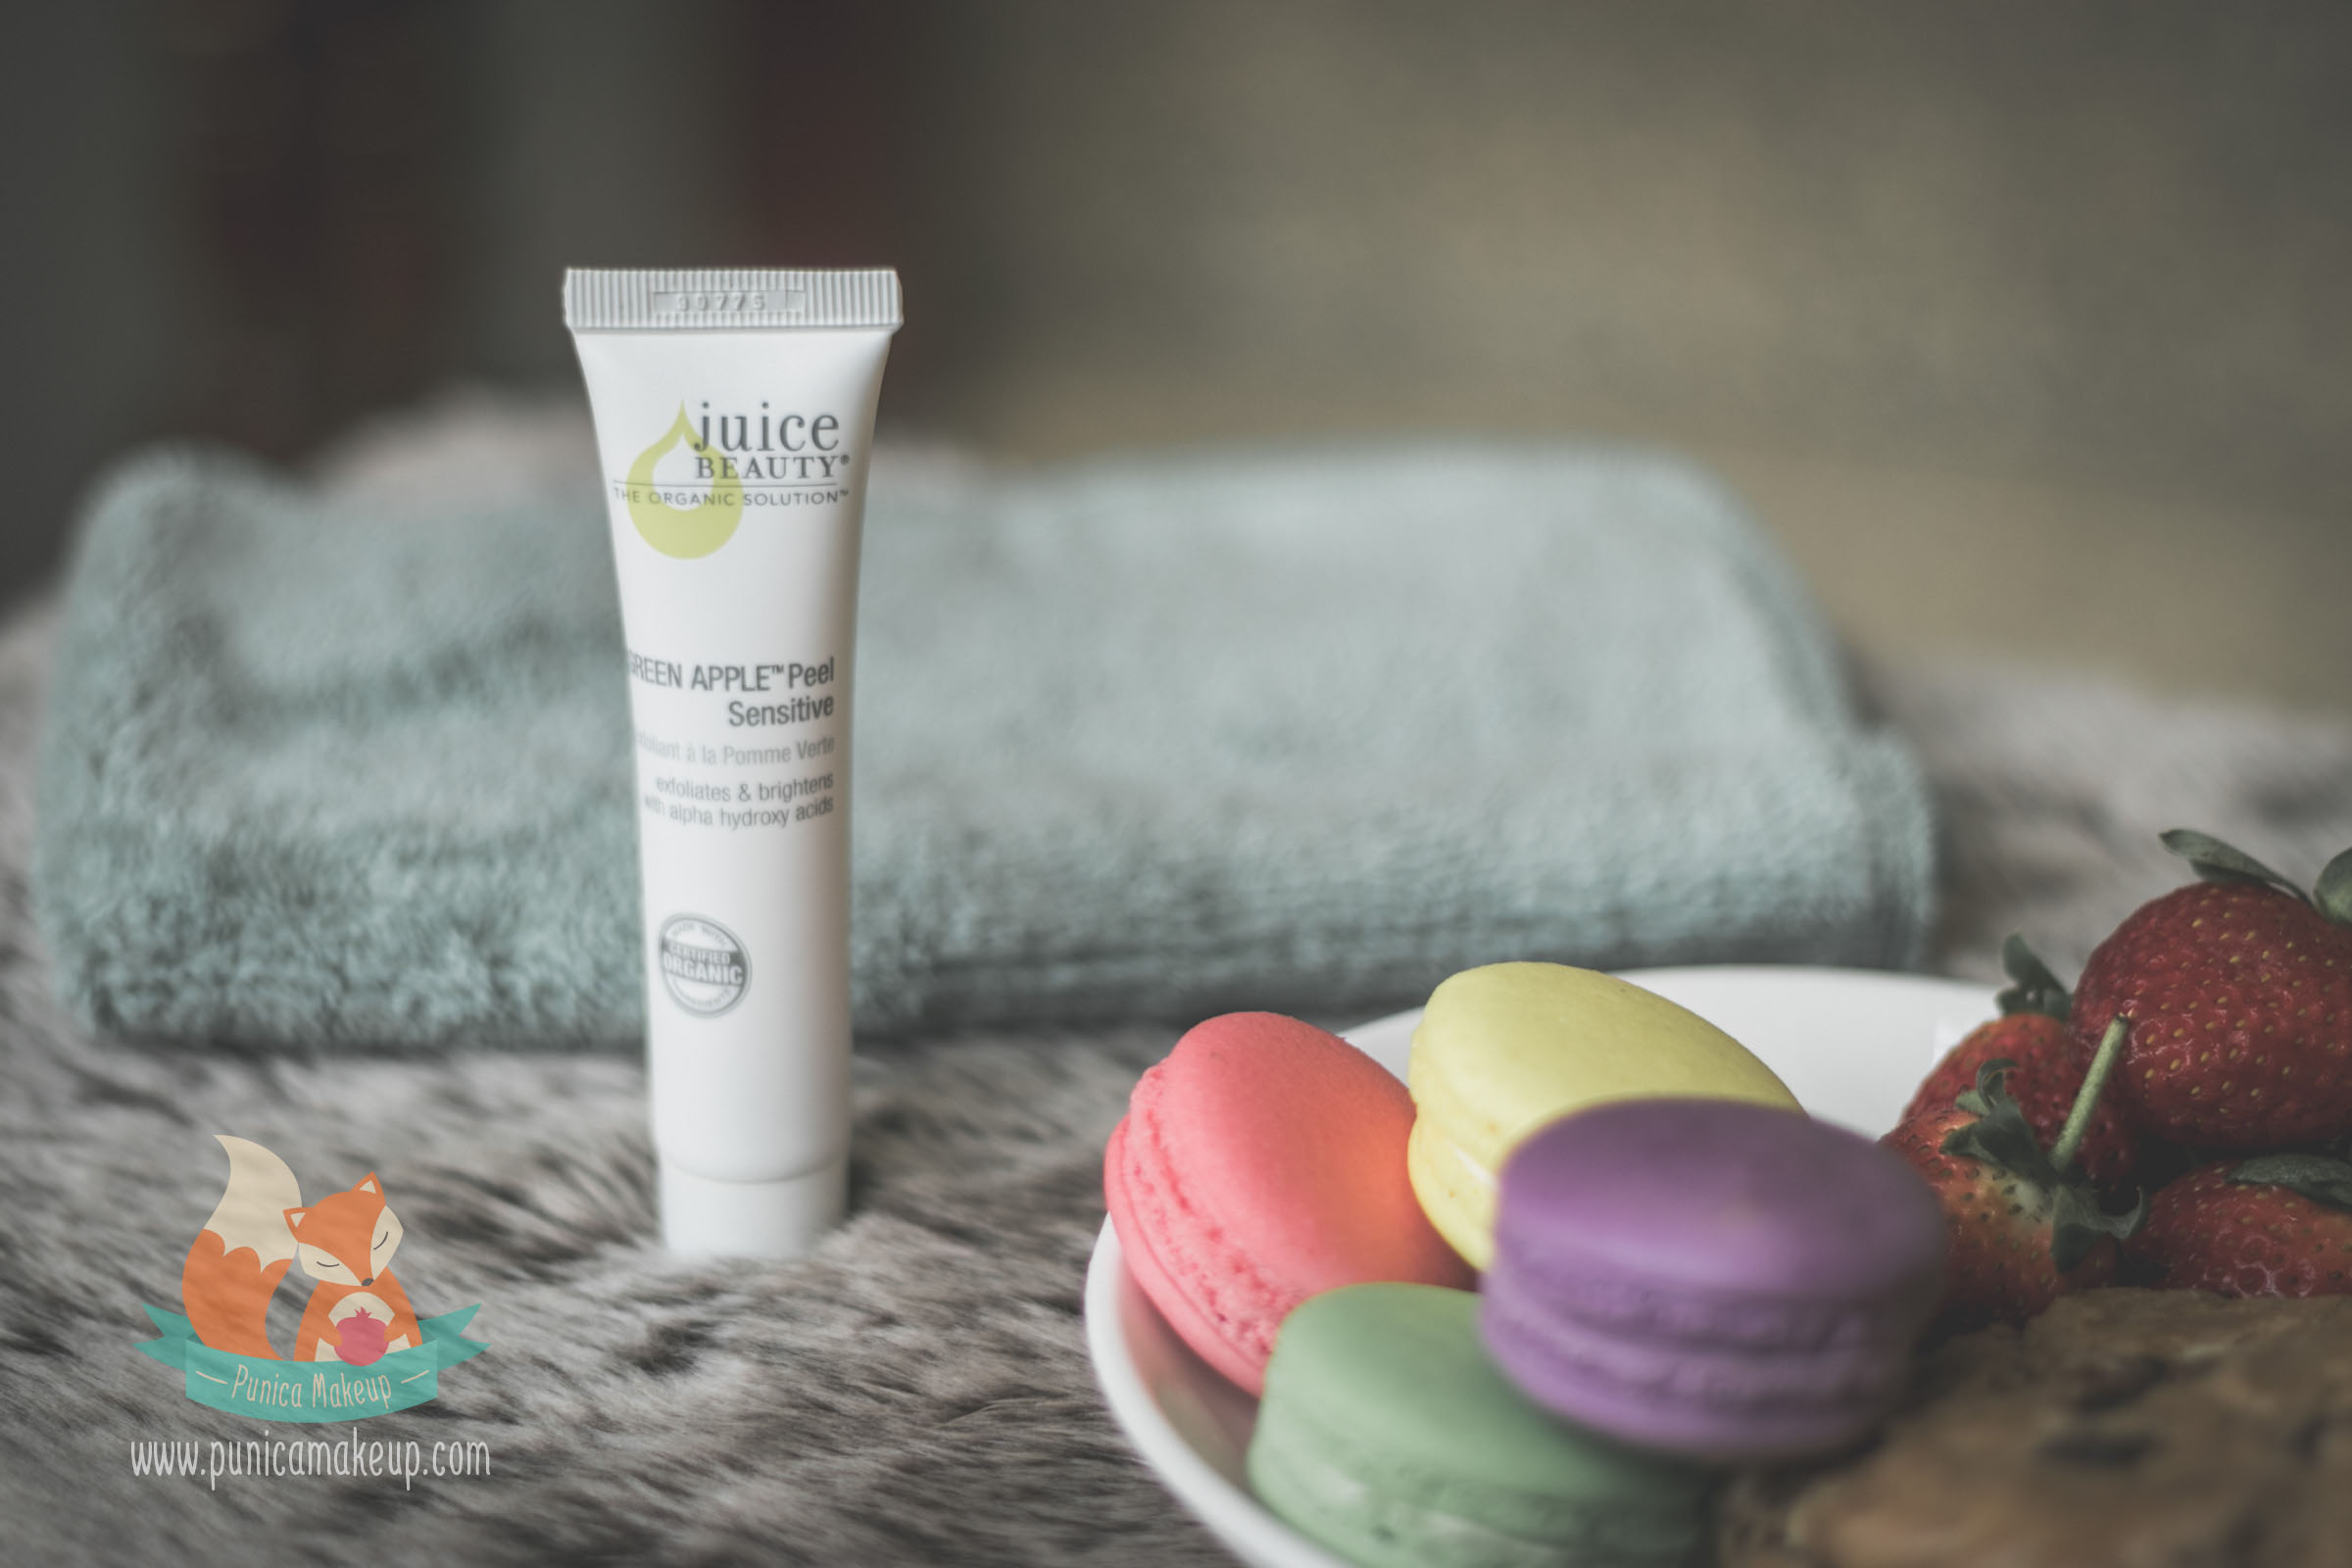 Stem Cellular Exfoliating Peel Spray by Juice Beauty #22